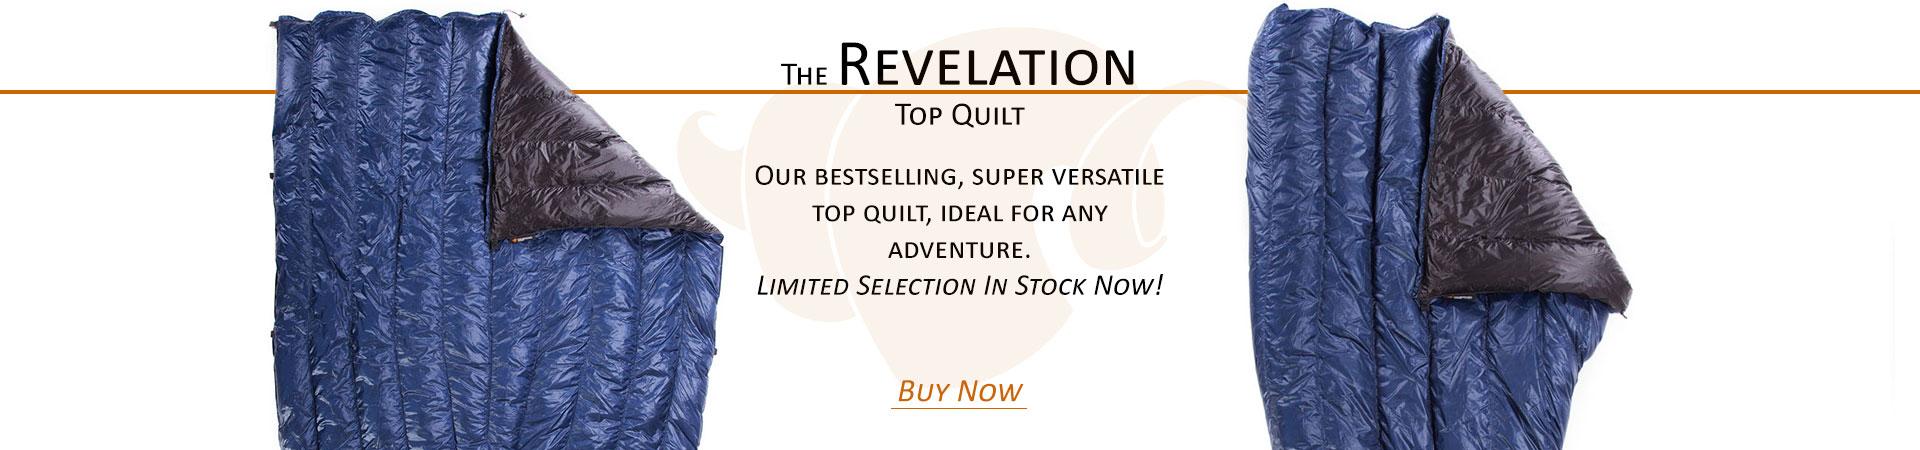 Revelation Top Quilt In-Stock